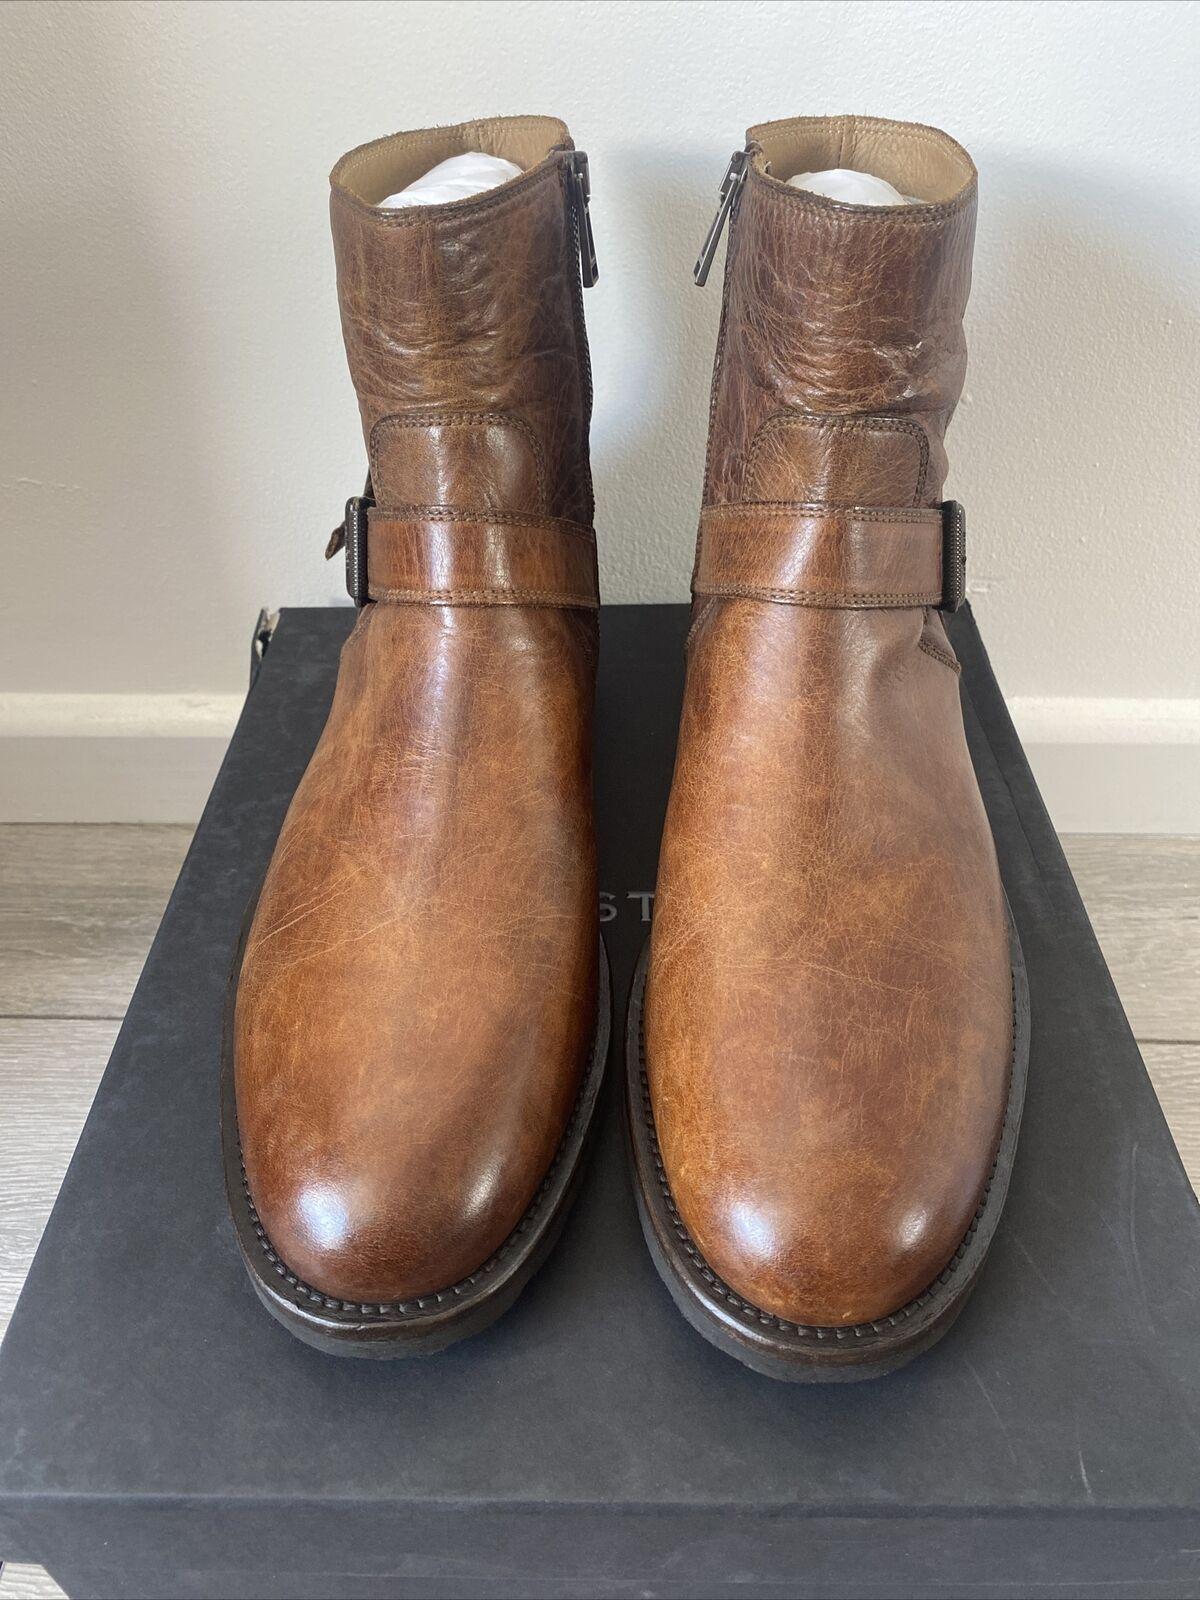 Belstaff Mens Trialmaster Short Boots Size 9.5 UK Or 43.5 EU In Cognac